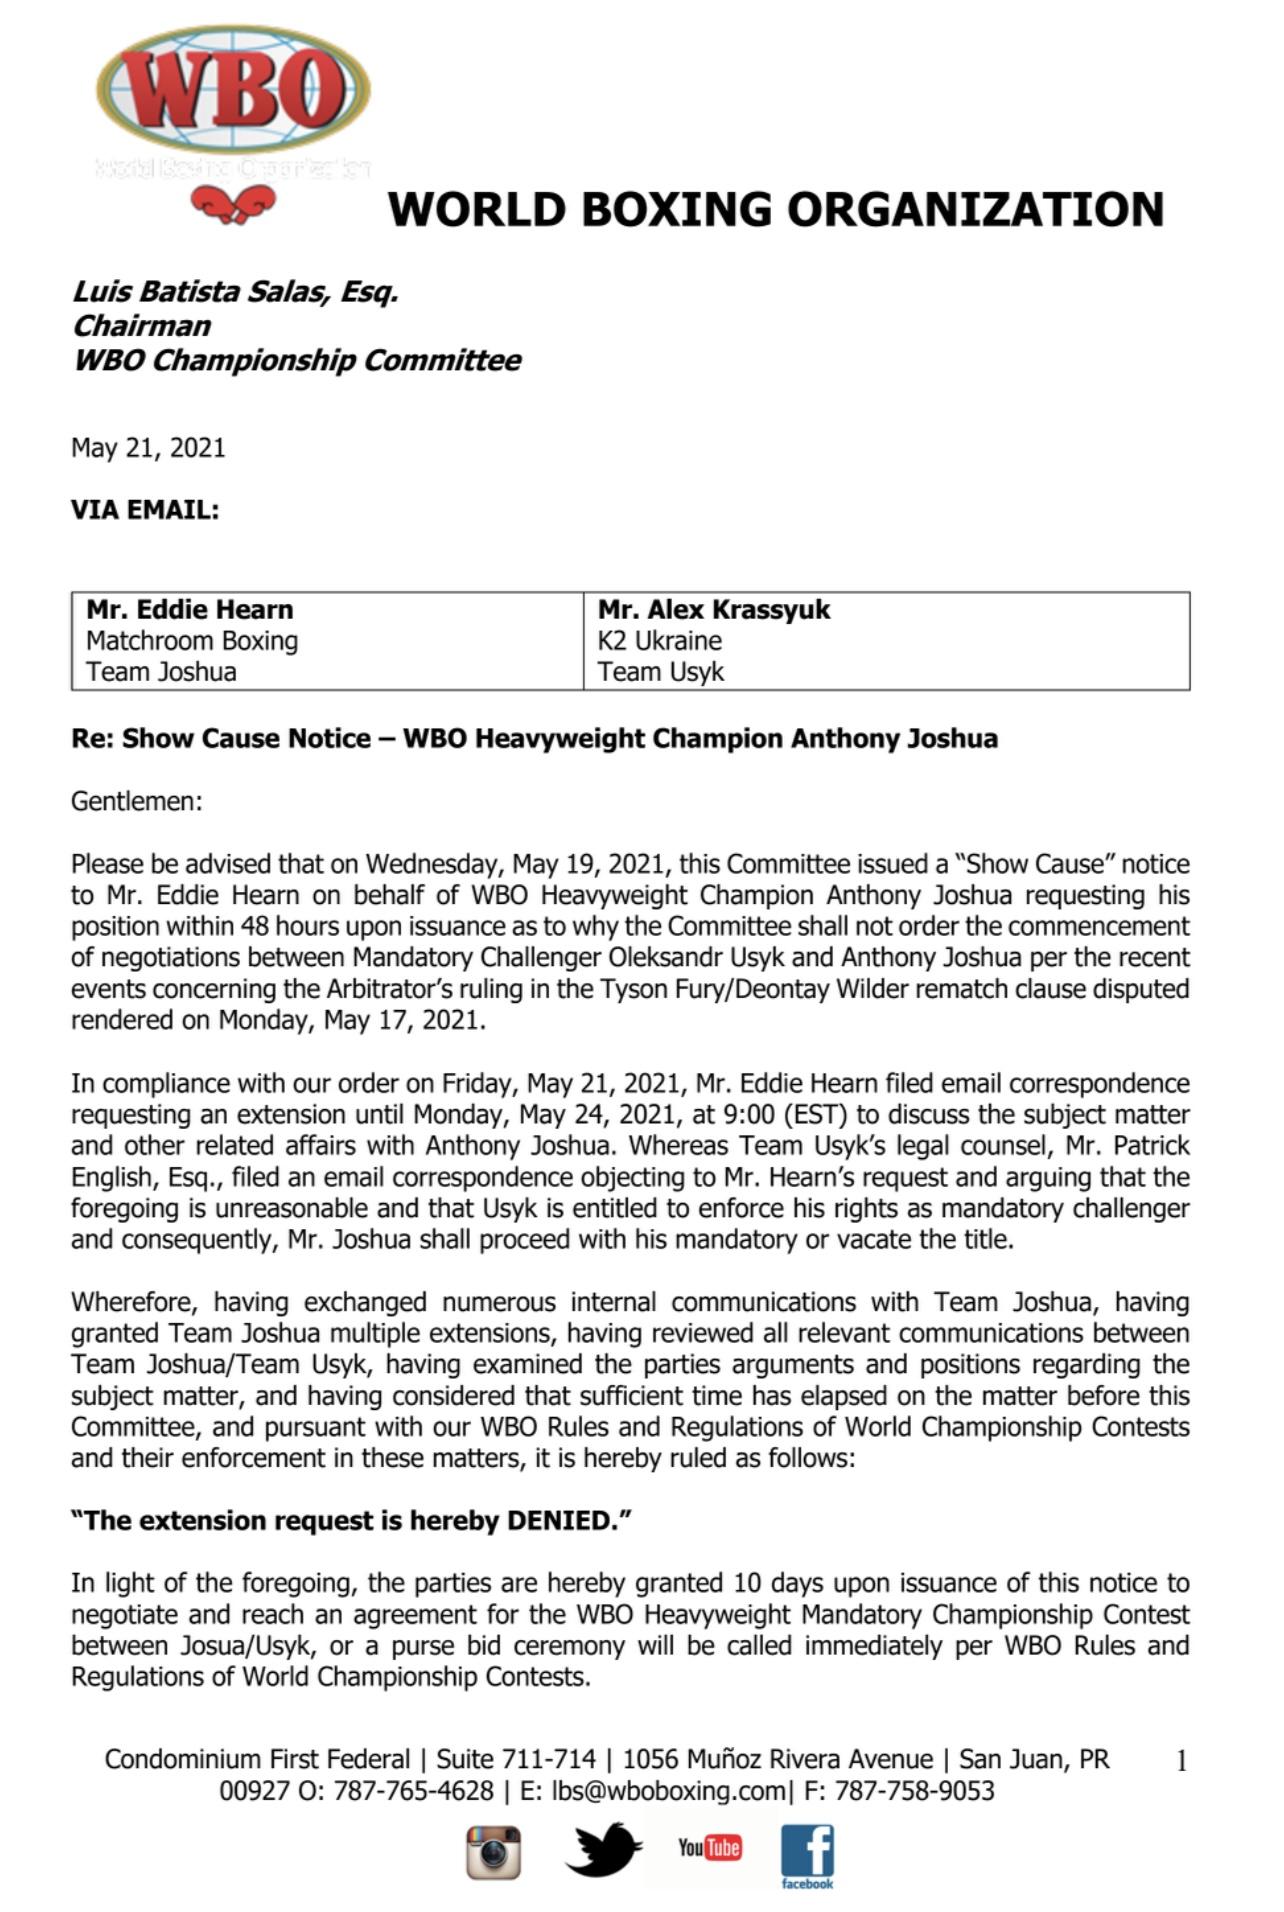 Official WBO Documents Re: Joshua vs. Usyk Heavyweight Showdown | Boxen247.com